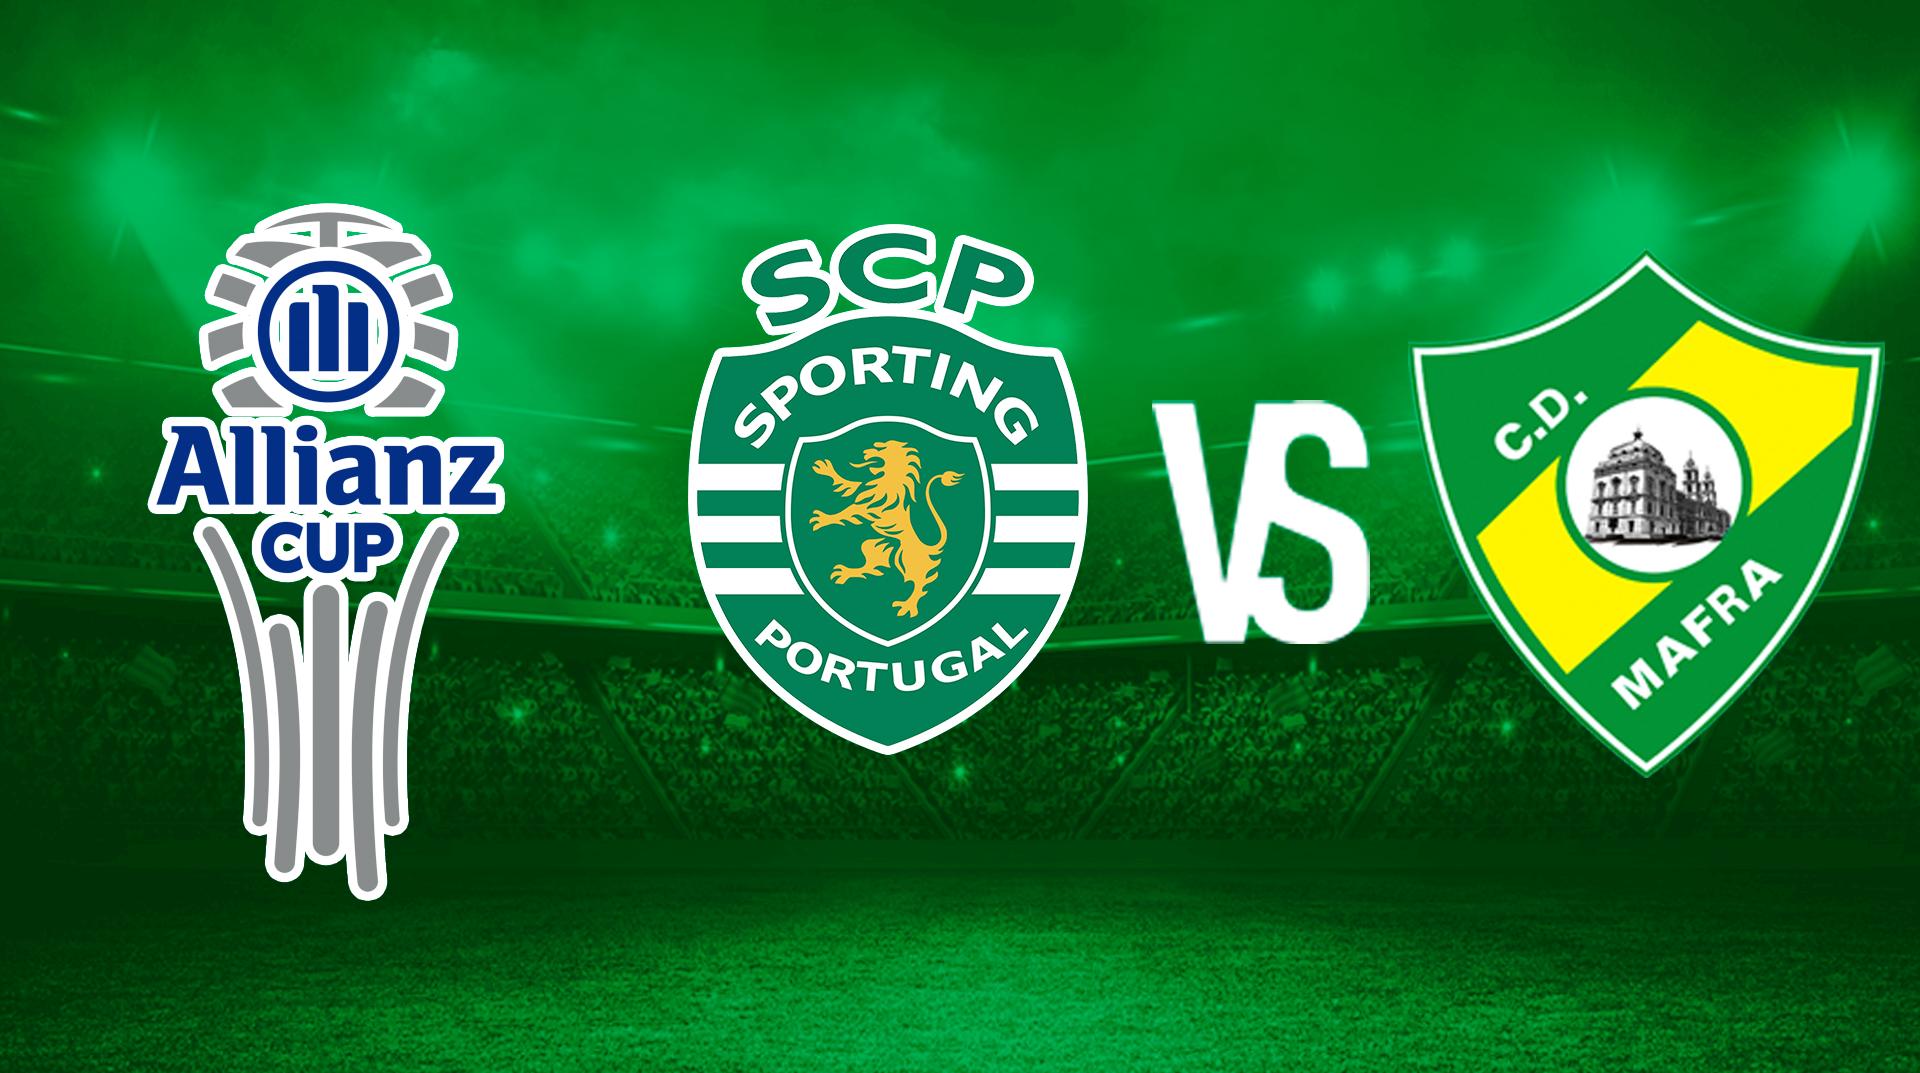 Sporting Lisboa vs CD Mafra en vivo y en directo online: GRATIS...